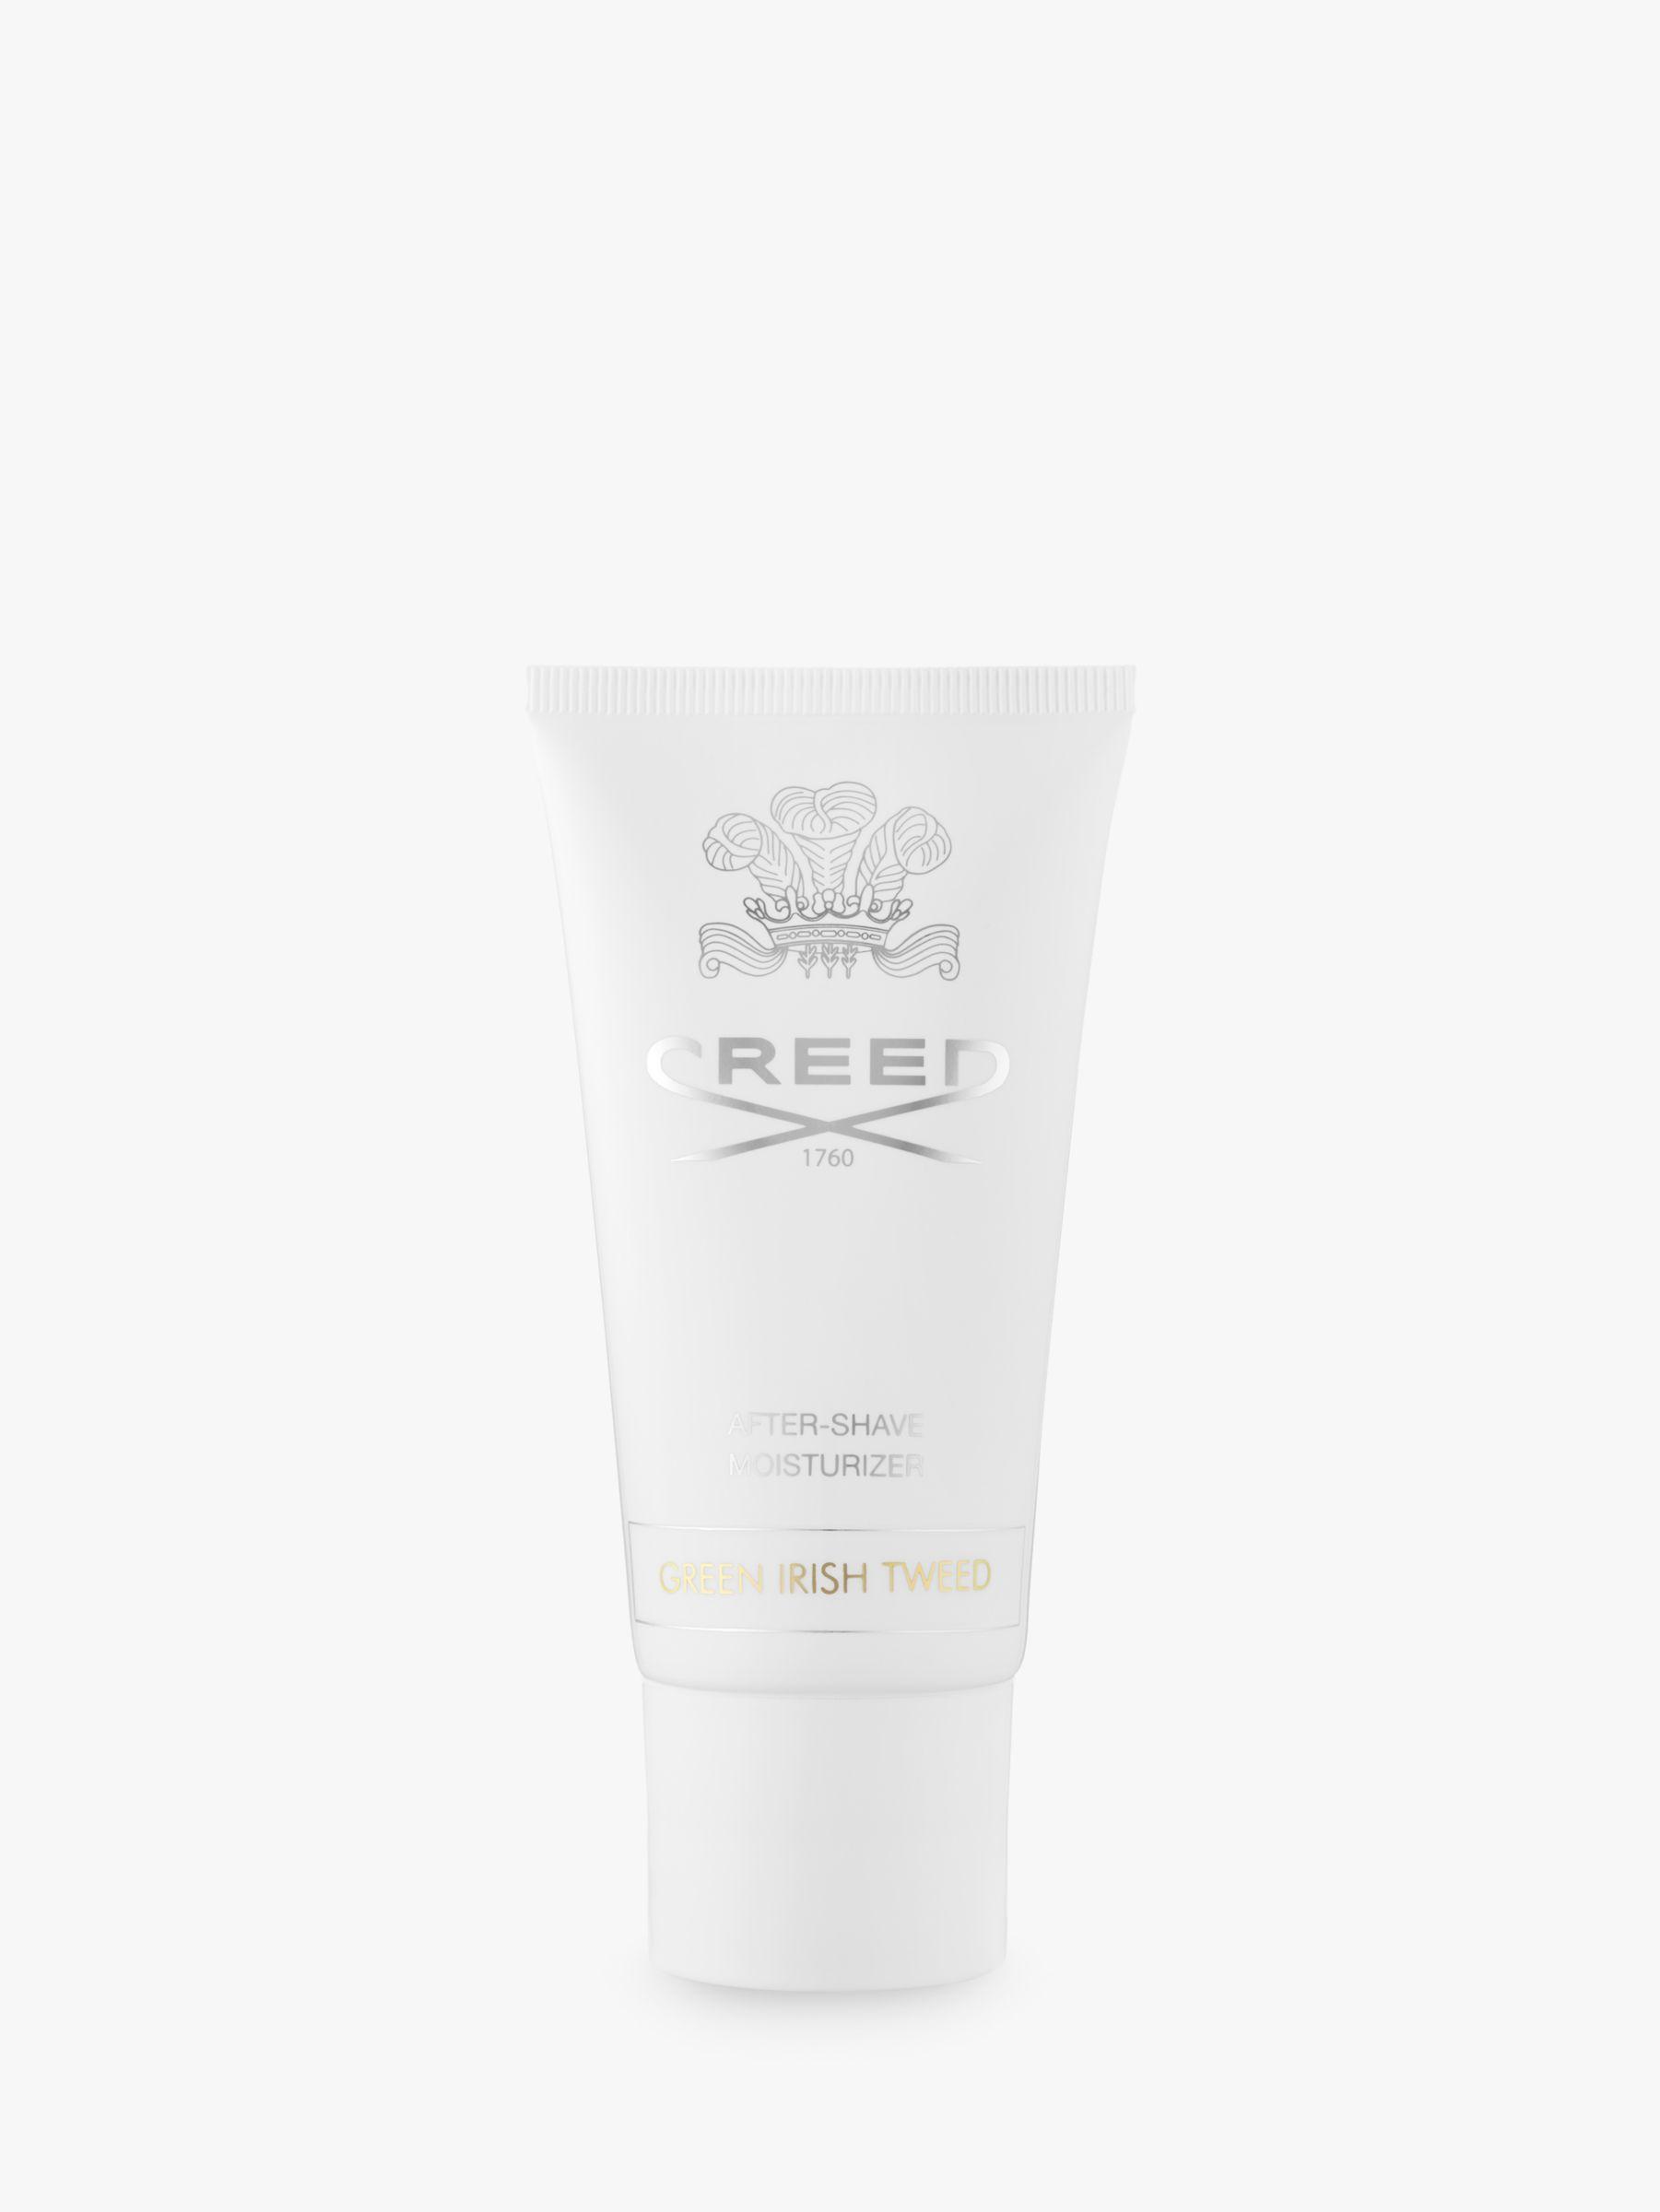 Creed CREED Green Irish Tweed After-Shave Moisturiser, 75ml